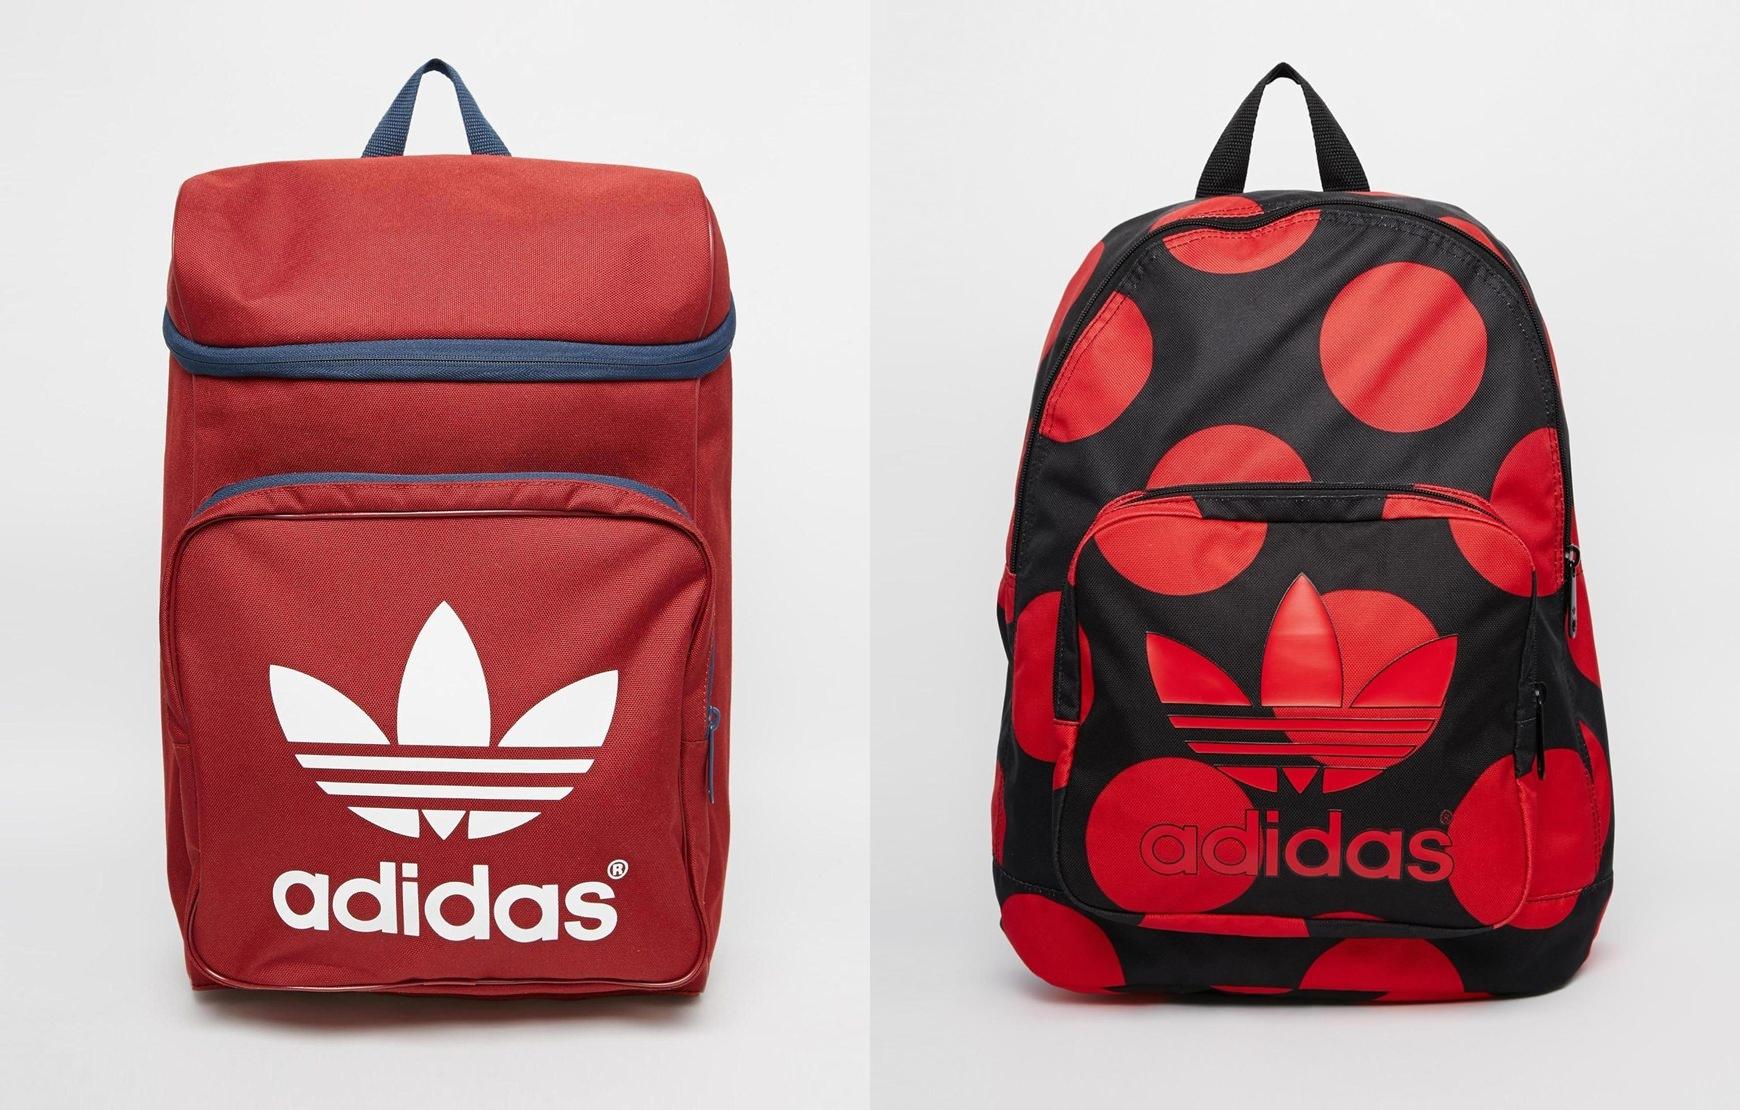 Adidas 在今年秋冬也推出數款紅色的背包,受到運動女孩的矚目!